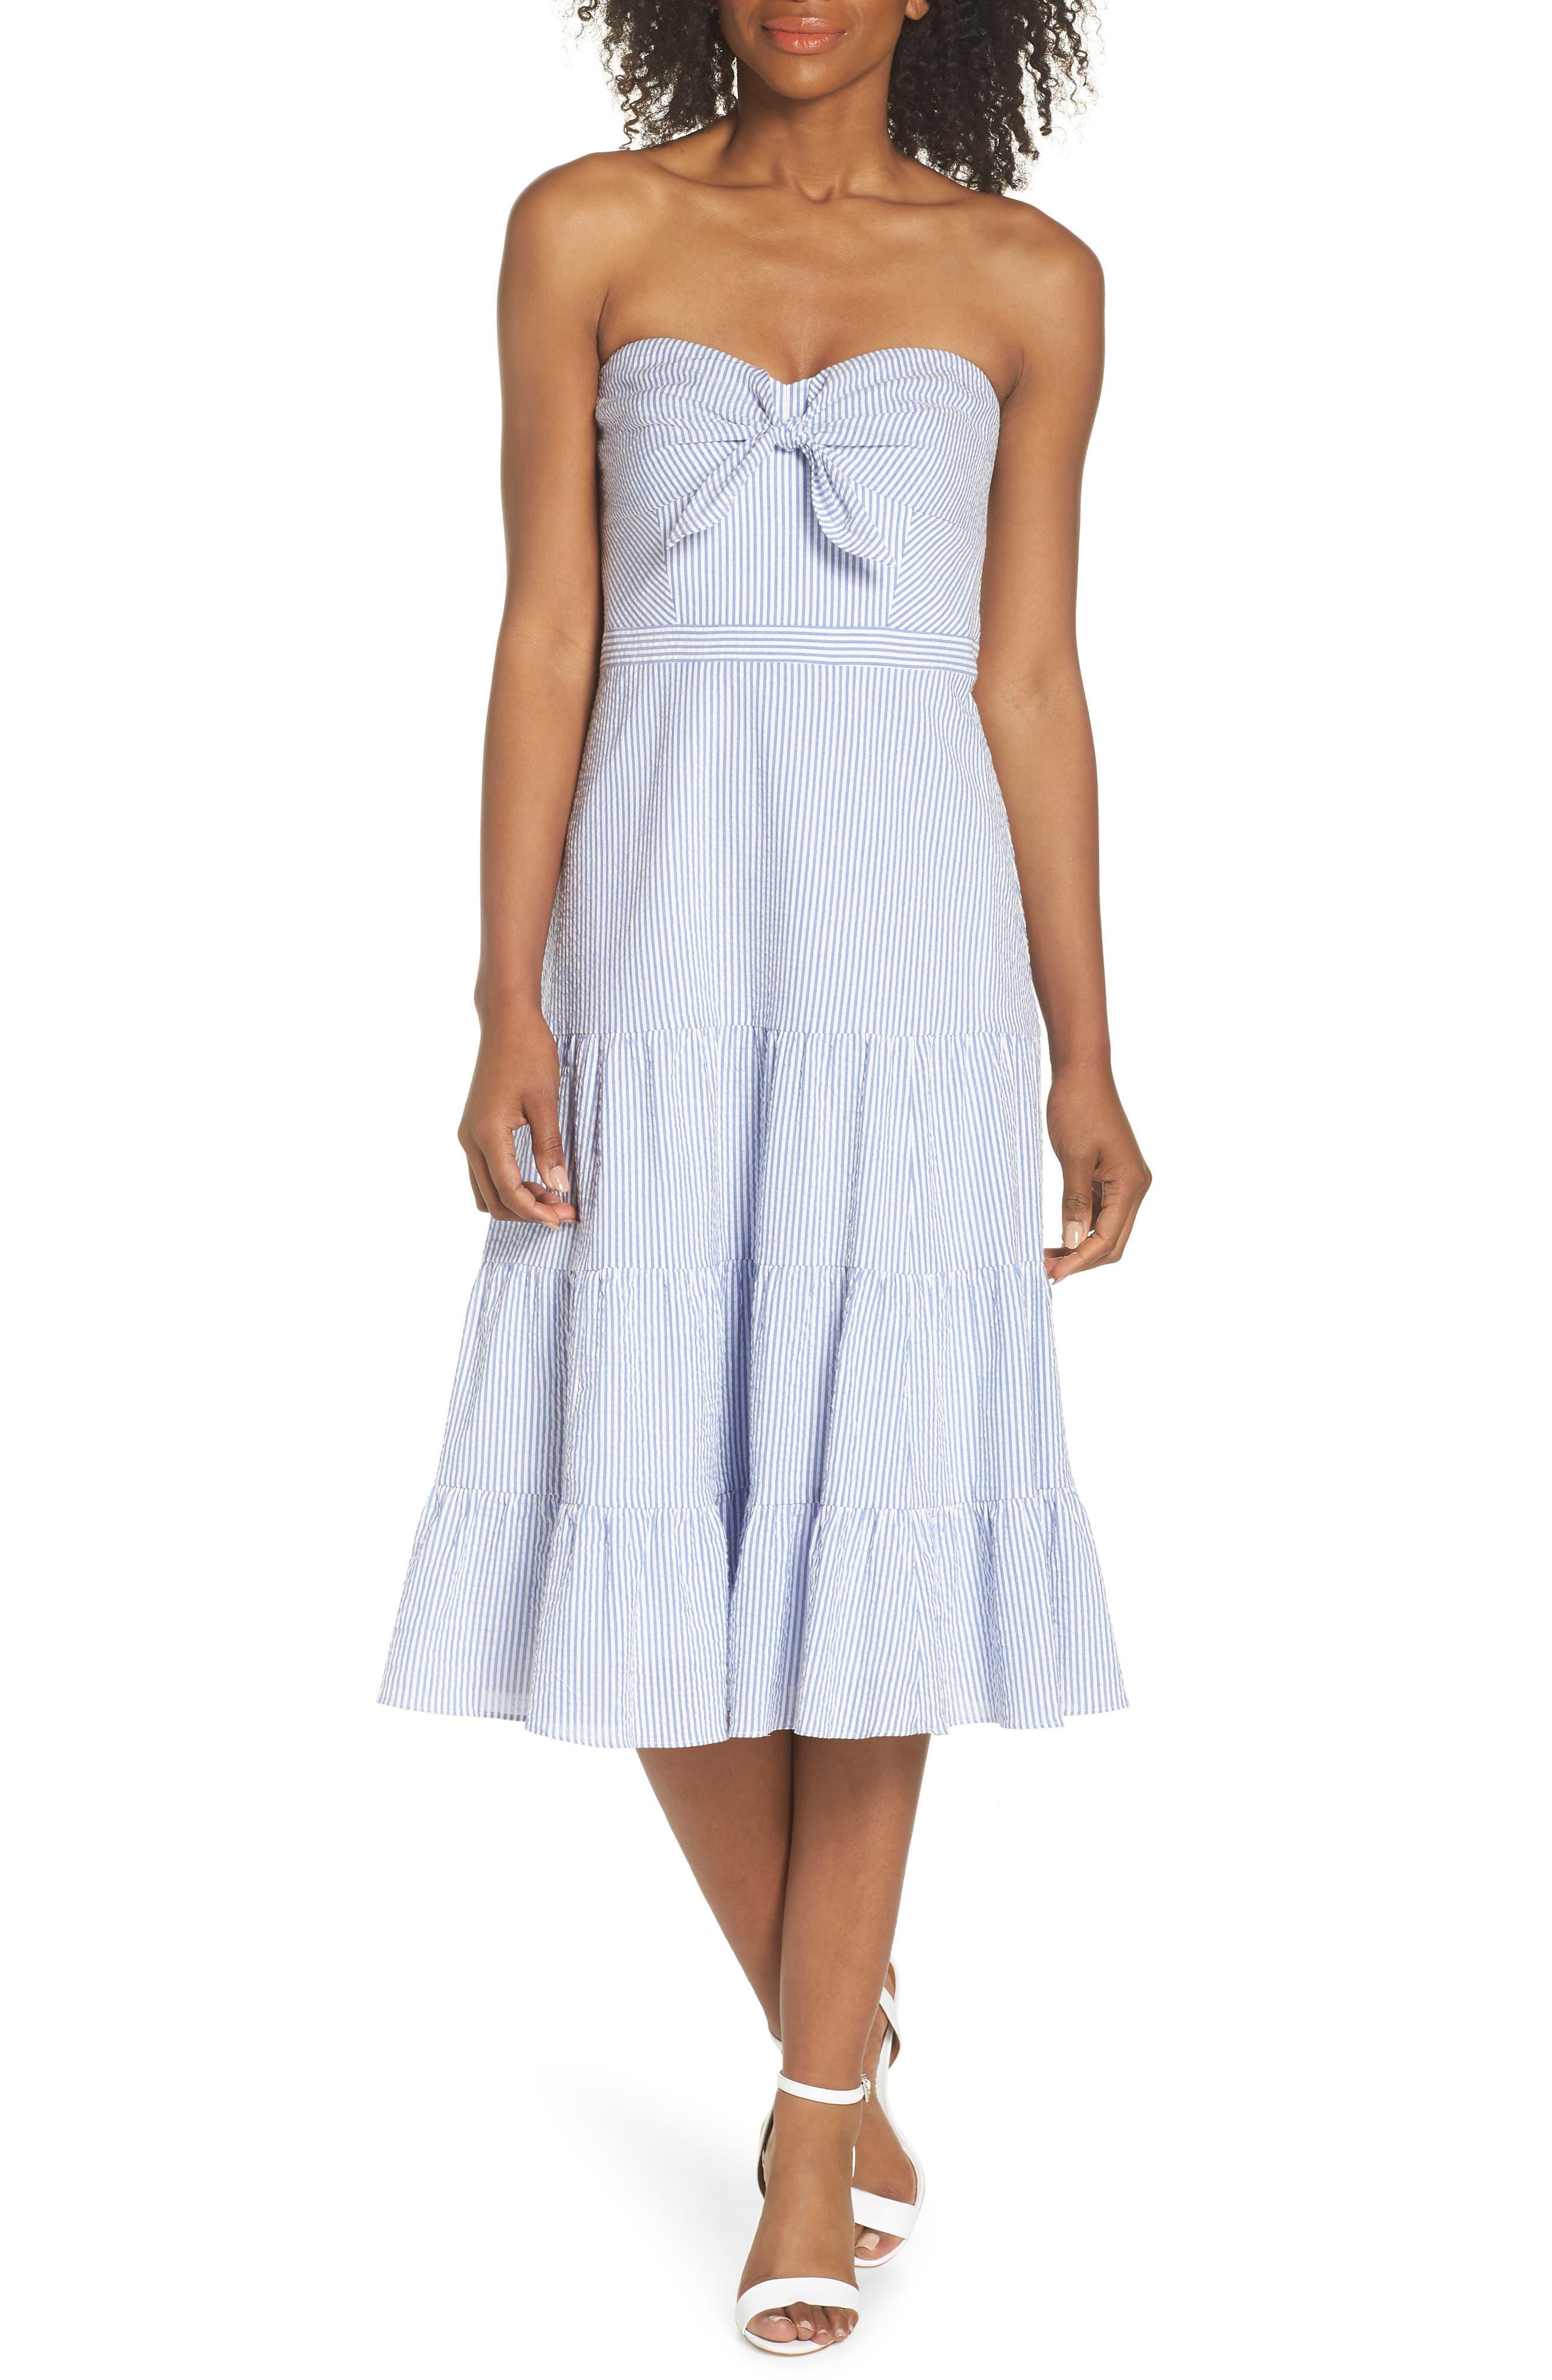 Main Image - J.Crew Tie Front Strapless Dress